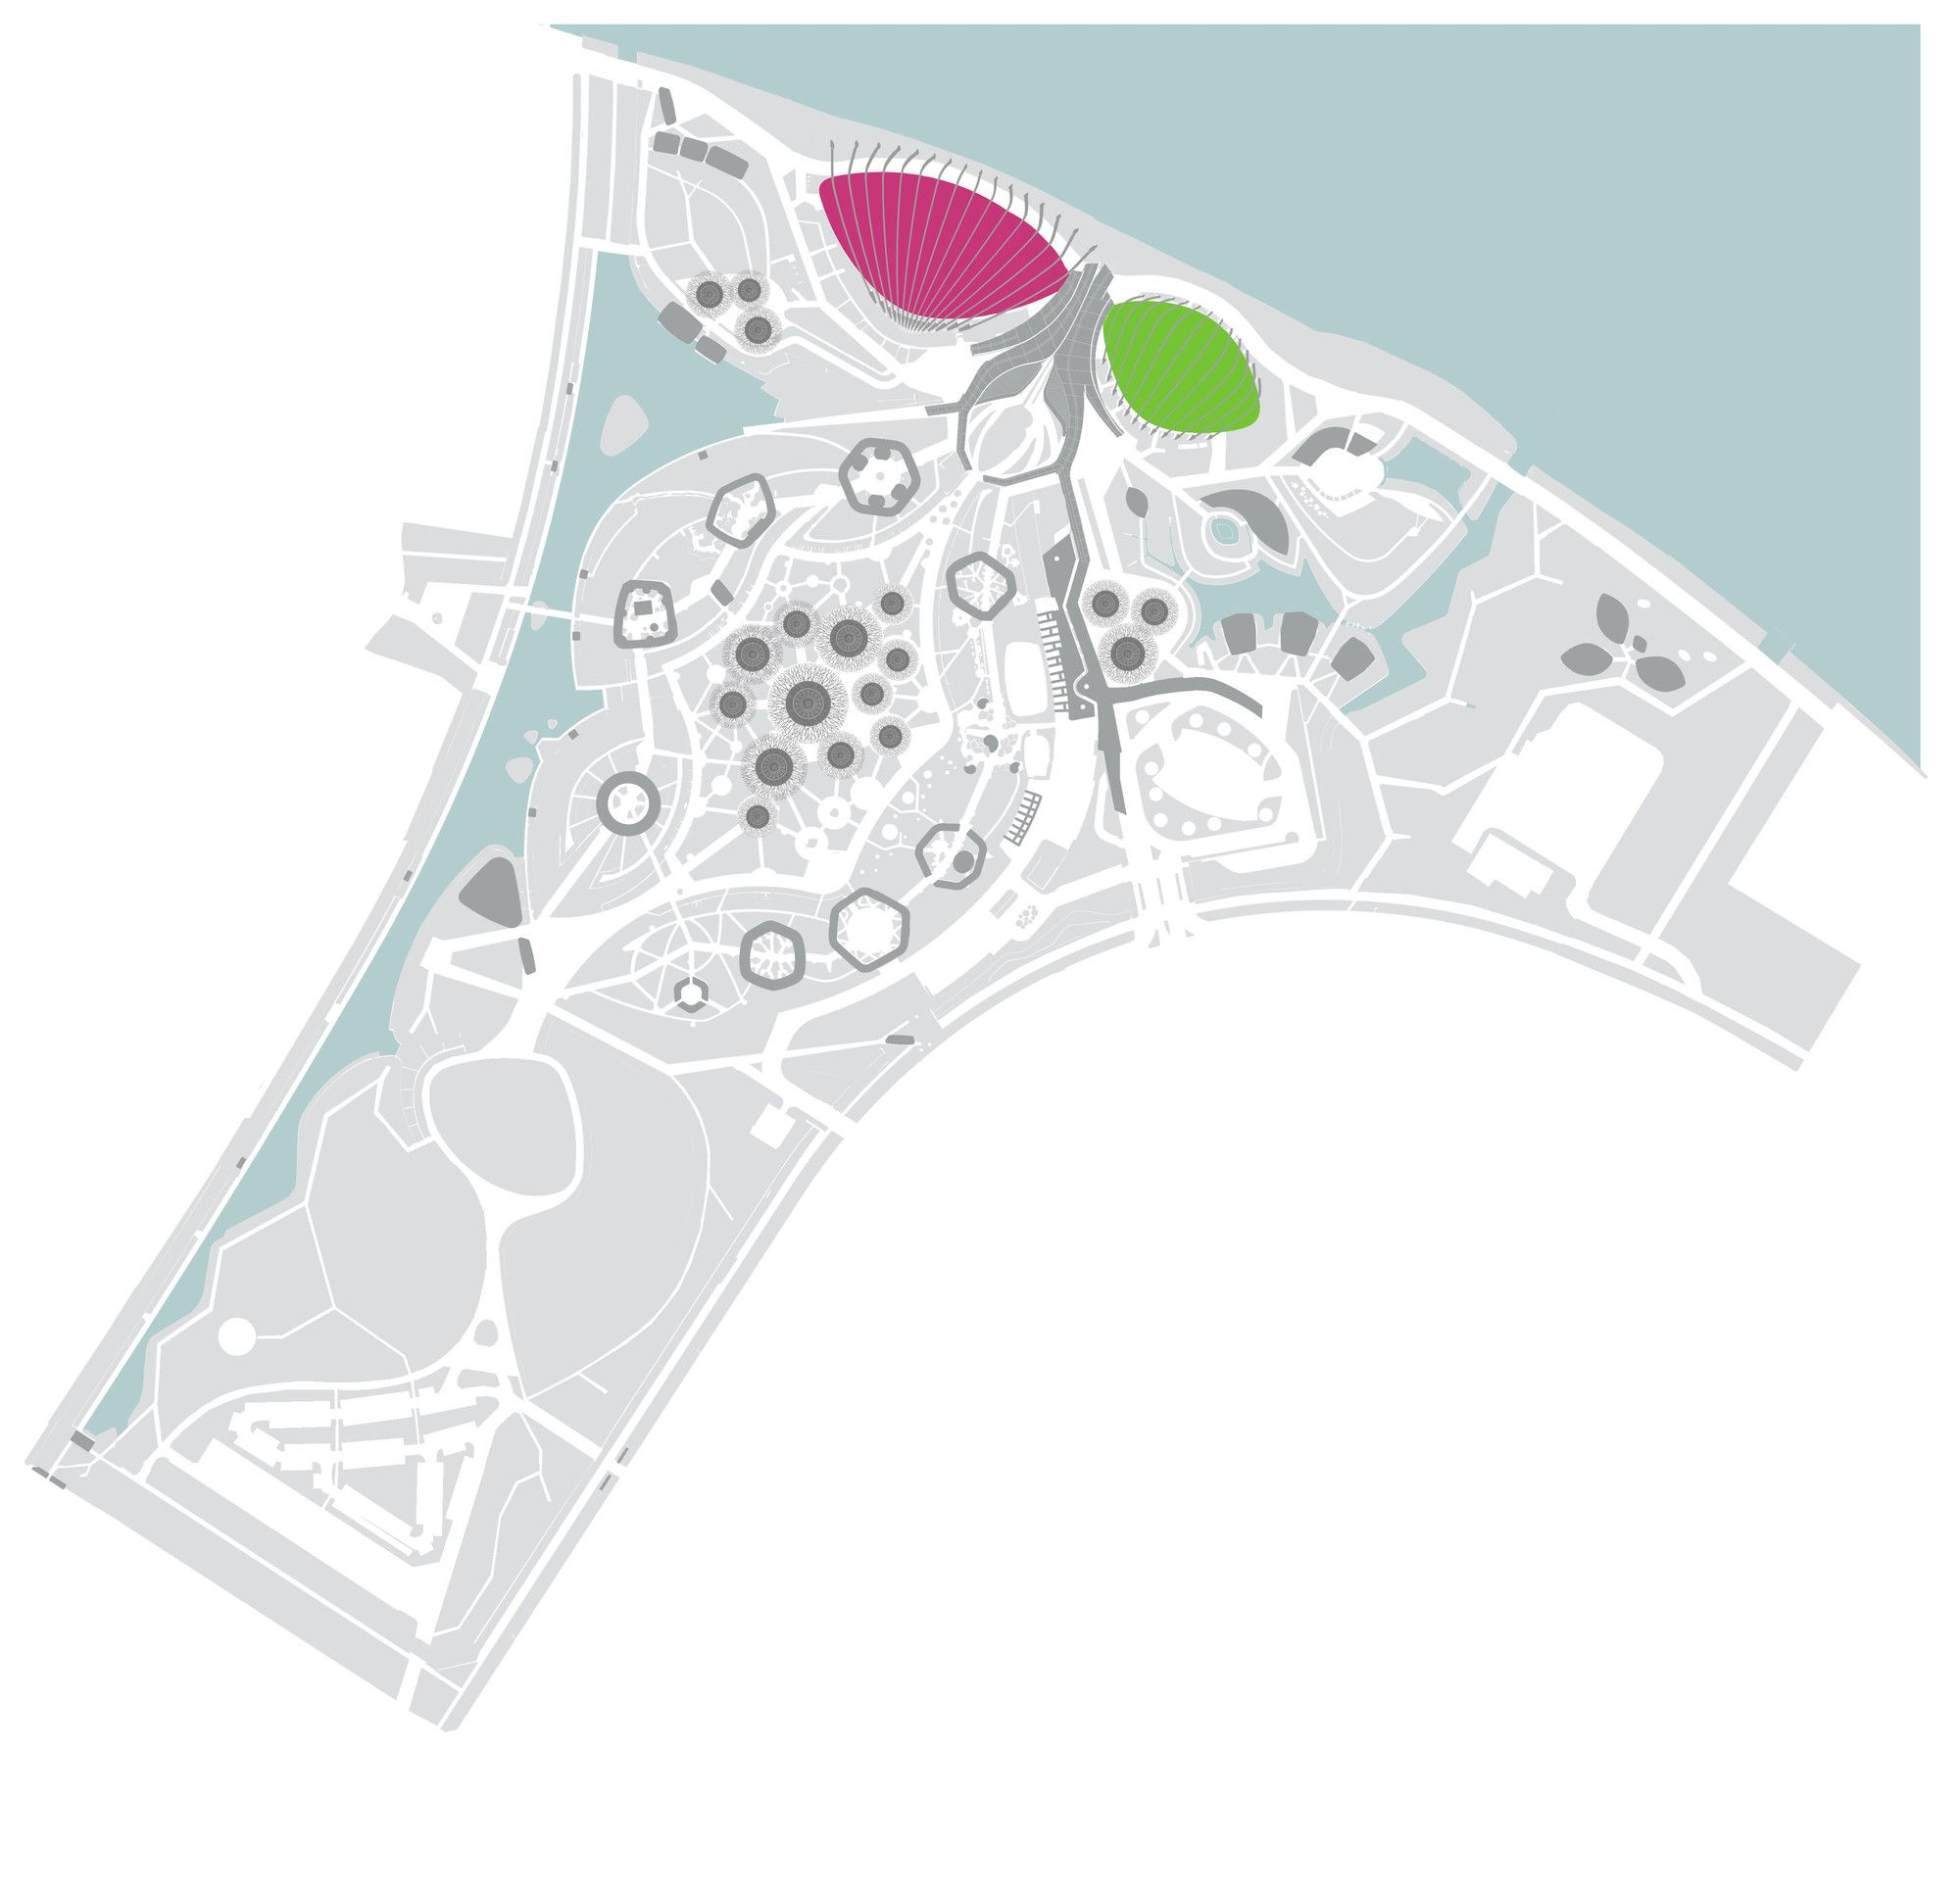 c3098a78645b66c77bdfd375cb603632 - Gardens By The Bay Landscape Architect